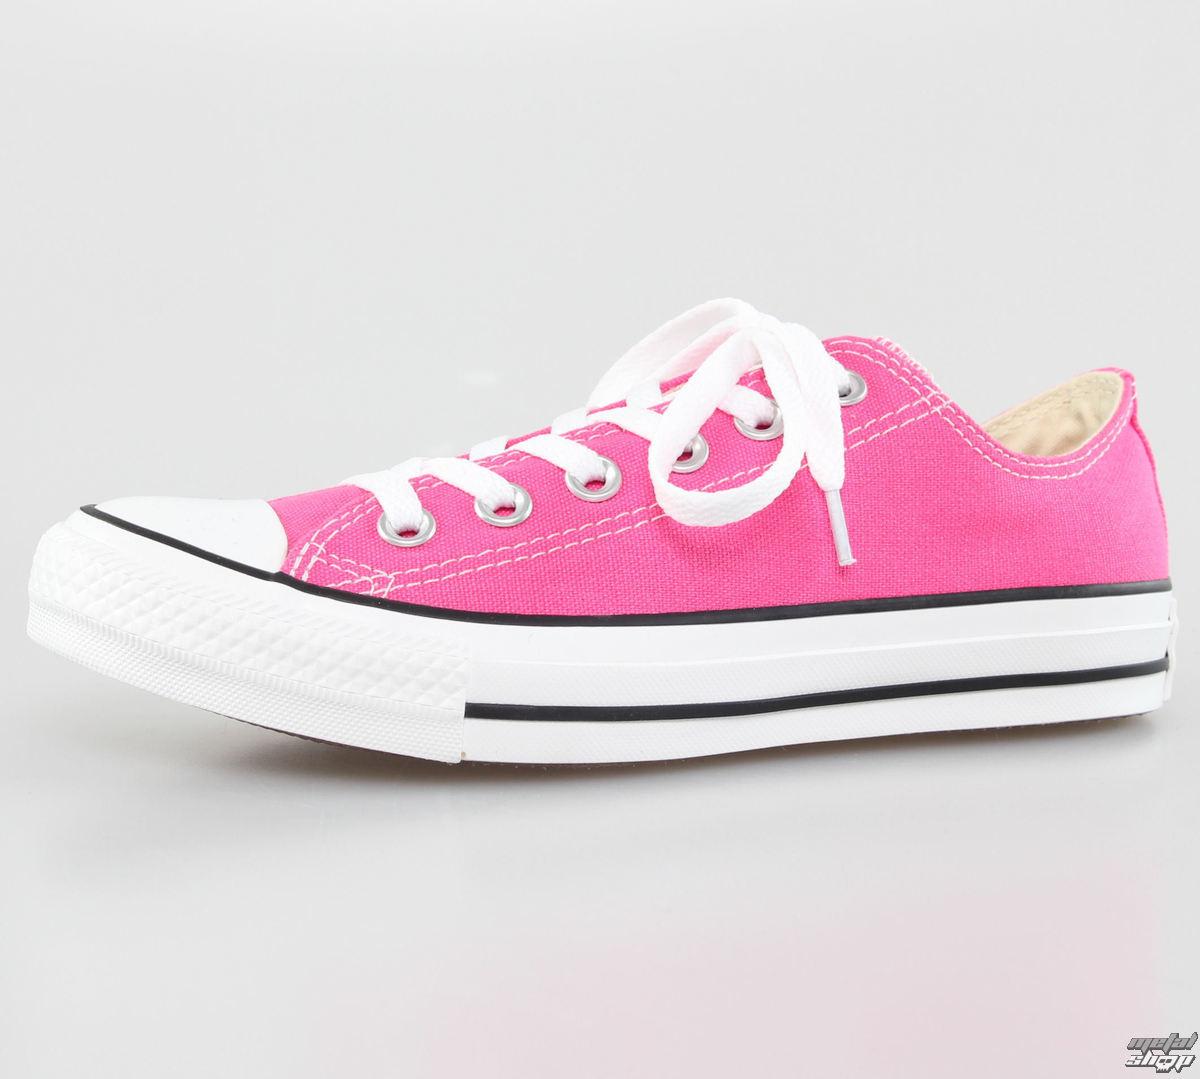 rövidszárú cipő női - CONVERSE - C147141 - Metalshop.hu 386d6dbe3c